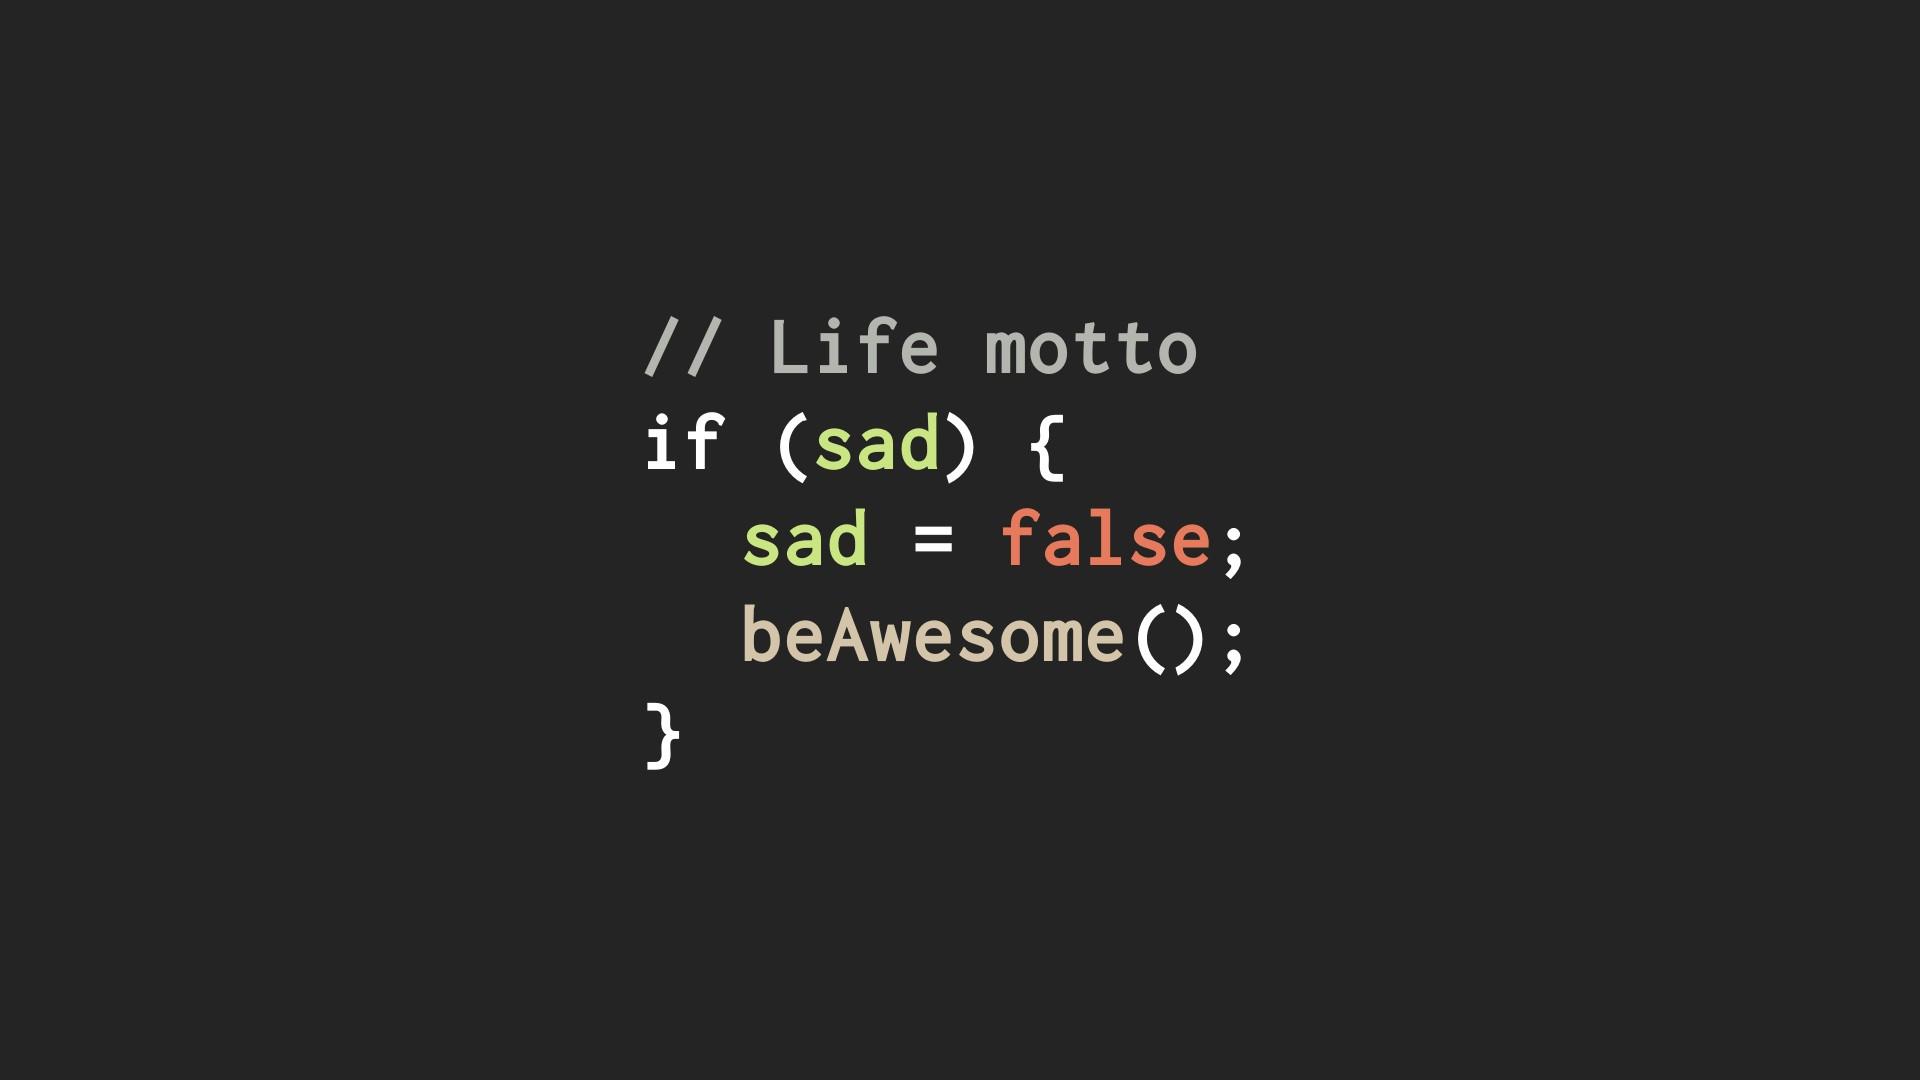 Consistency Quotes Wallpaper Nerds Computer Minimalism Programming Writing